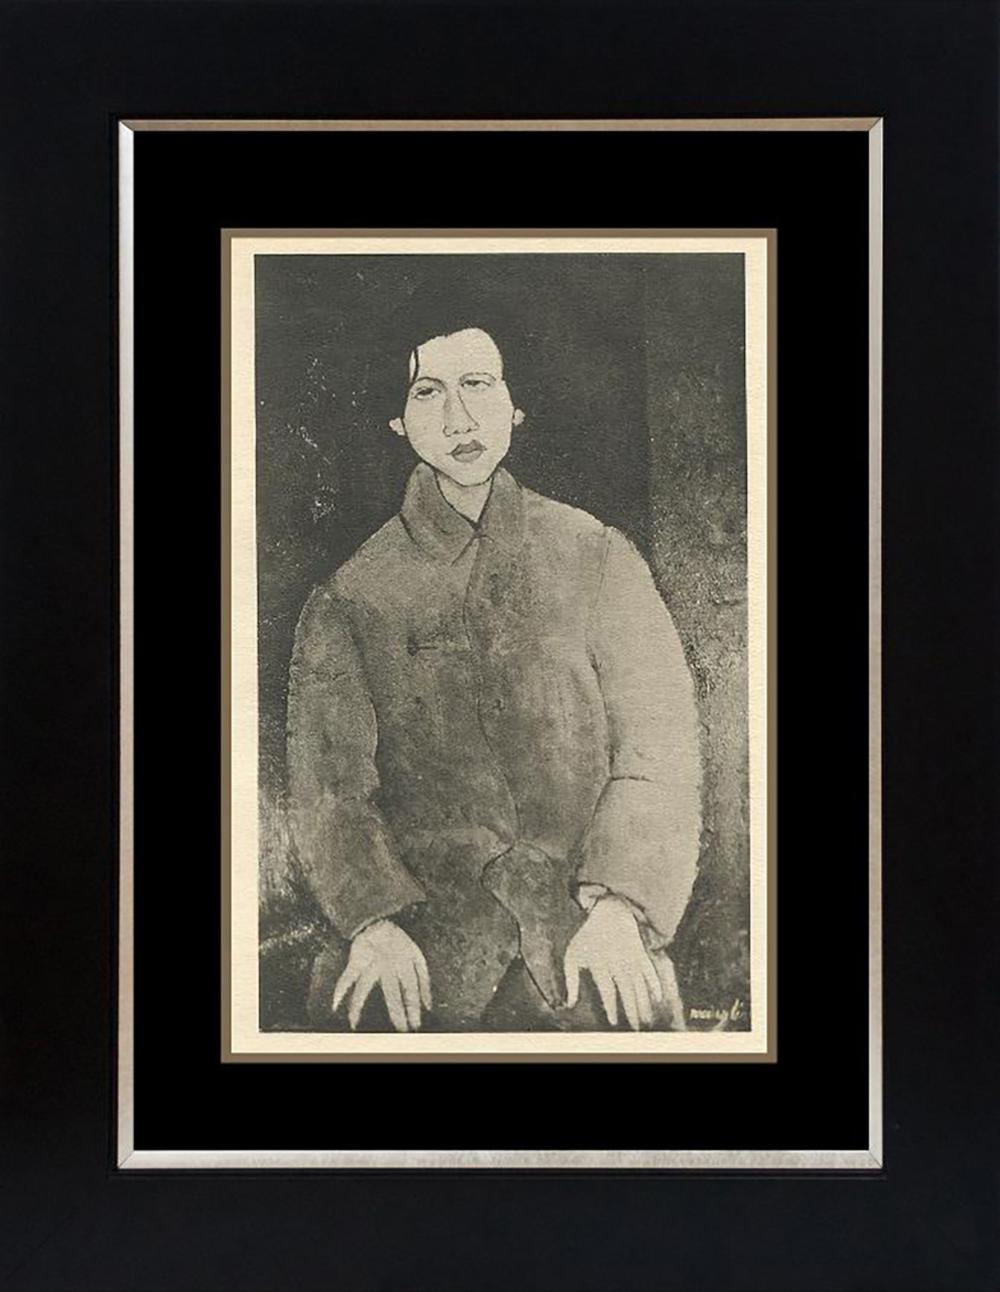 Modigliani Lithograph from 1929